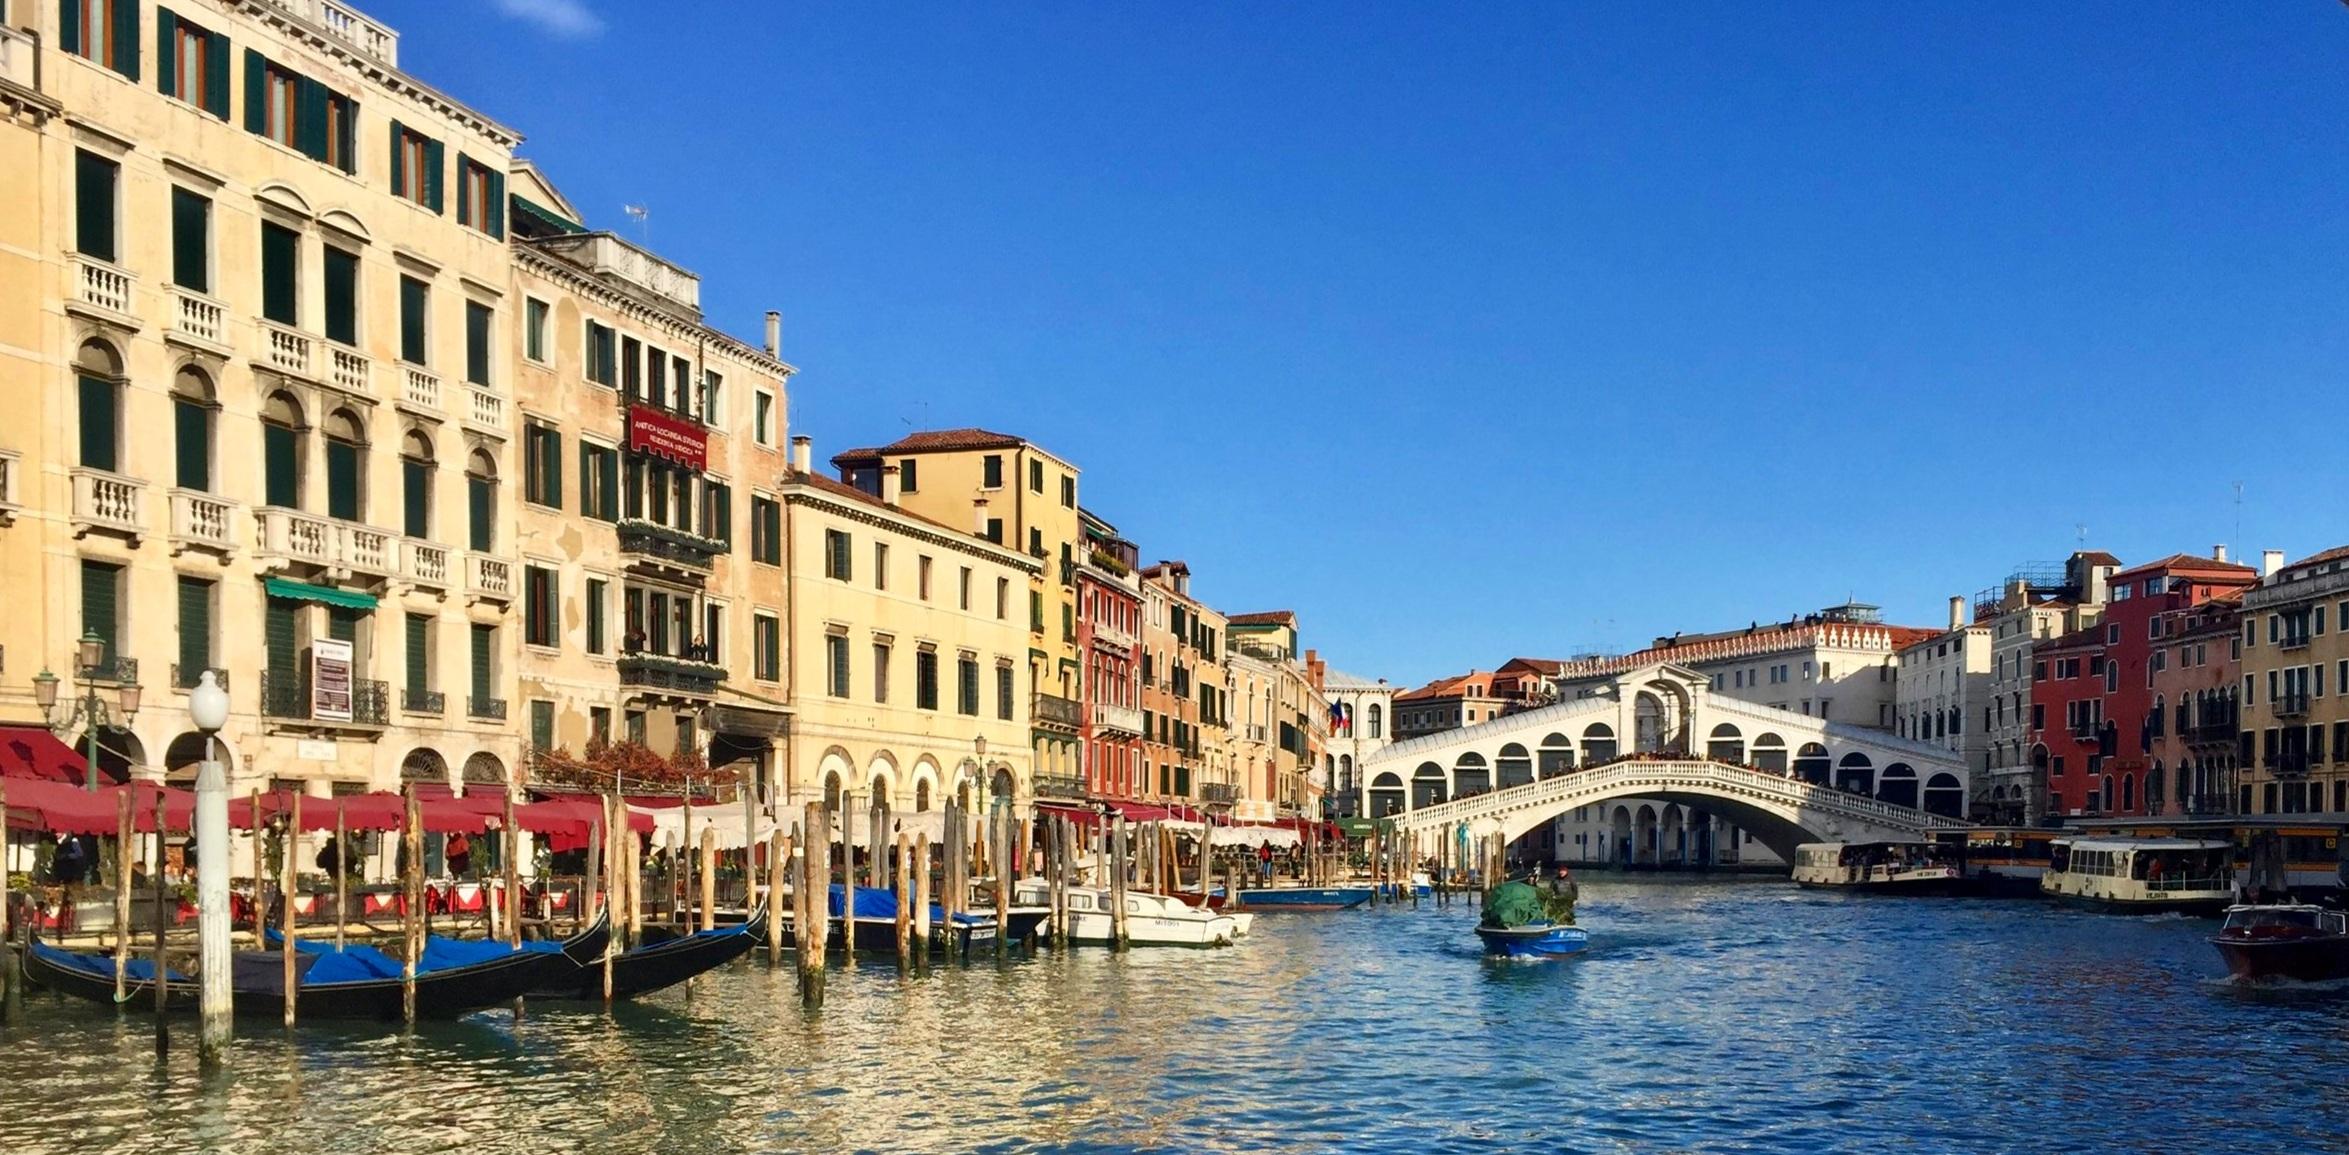 Rialto Bridge from the Grand Canal - San Polo, San Marco